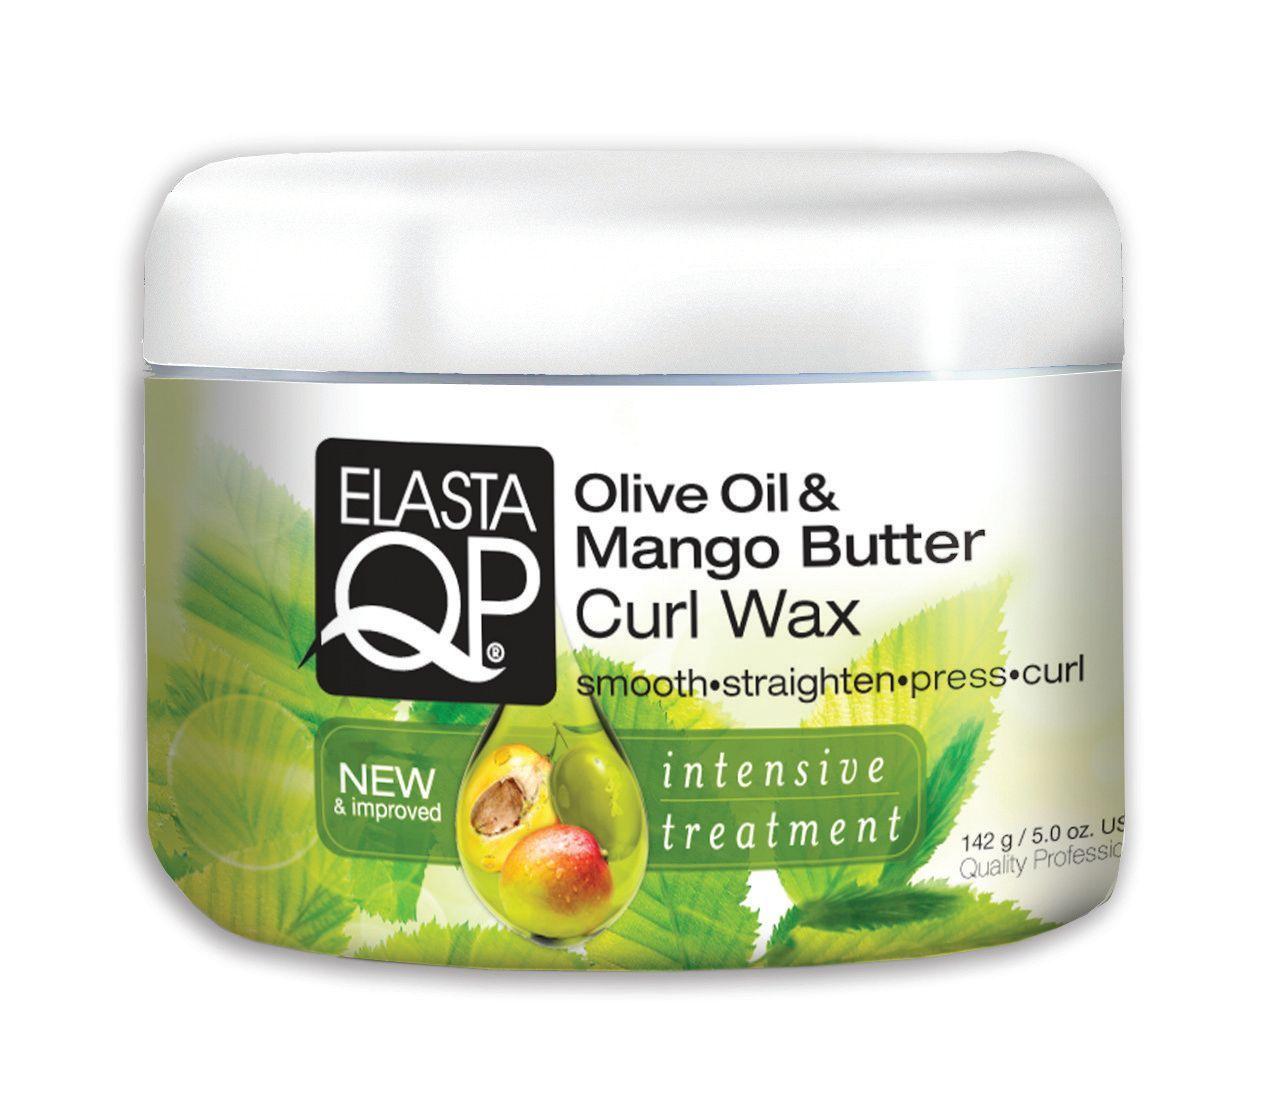 Elasta QP Olive Oil & Mango Butter Curl Wax - 5oz